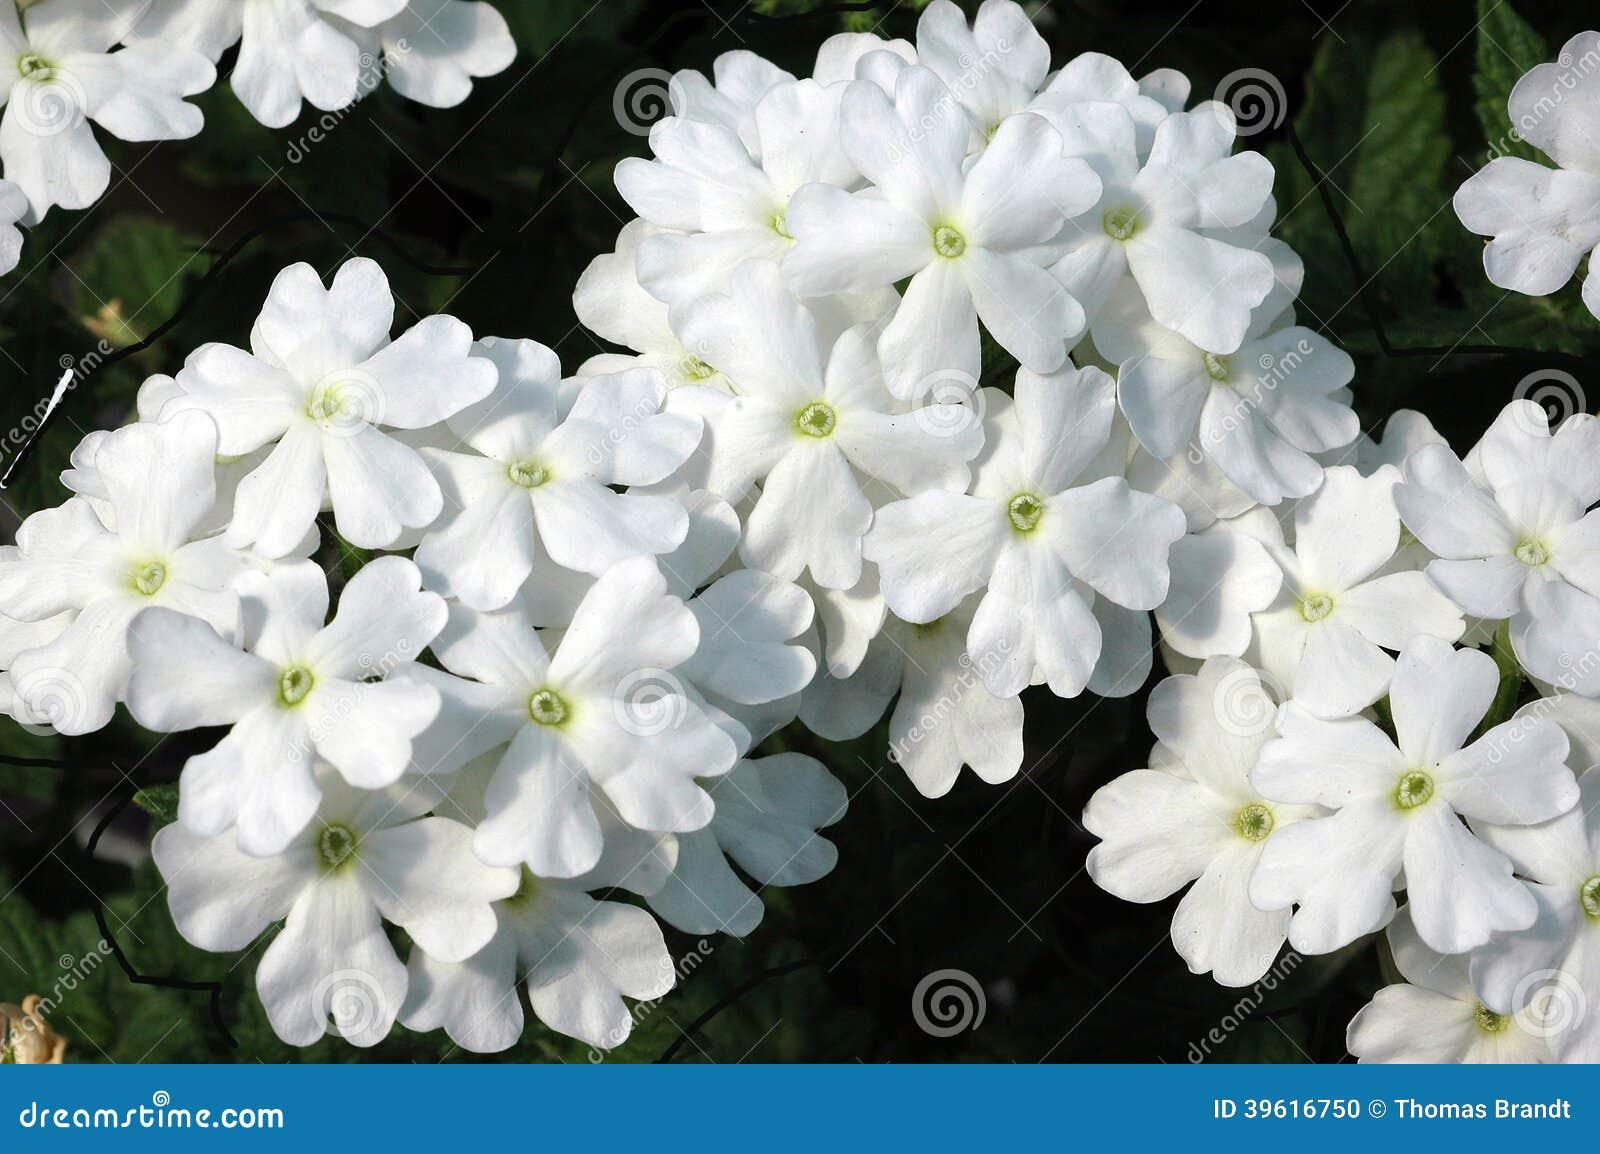 White Trailing Verbena Flowers Stock Photo Image Of Flower